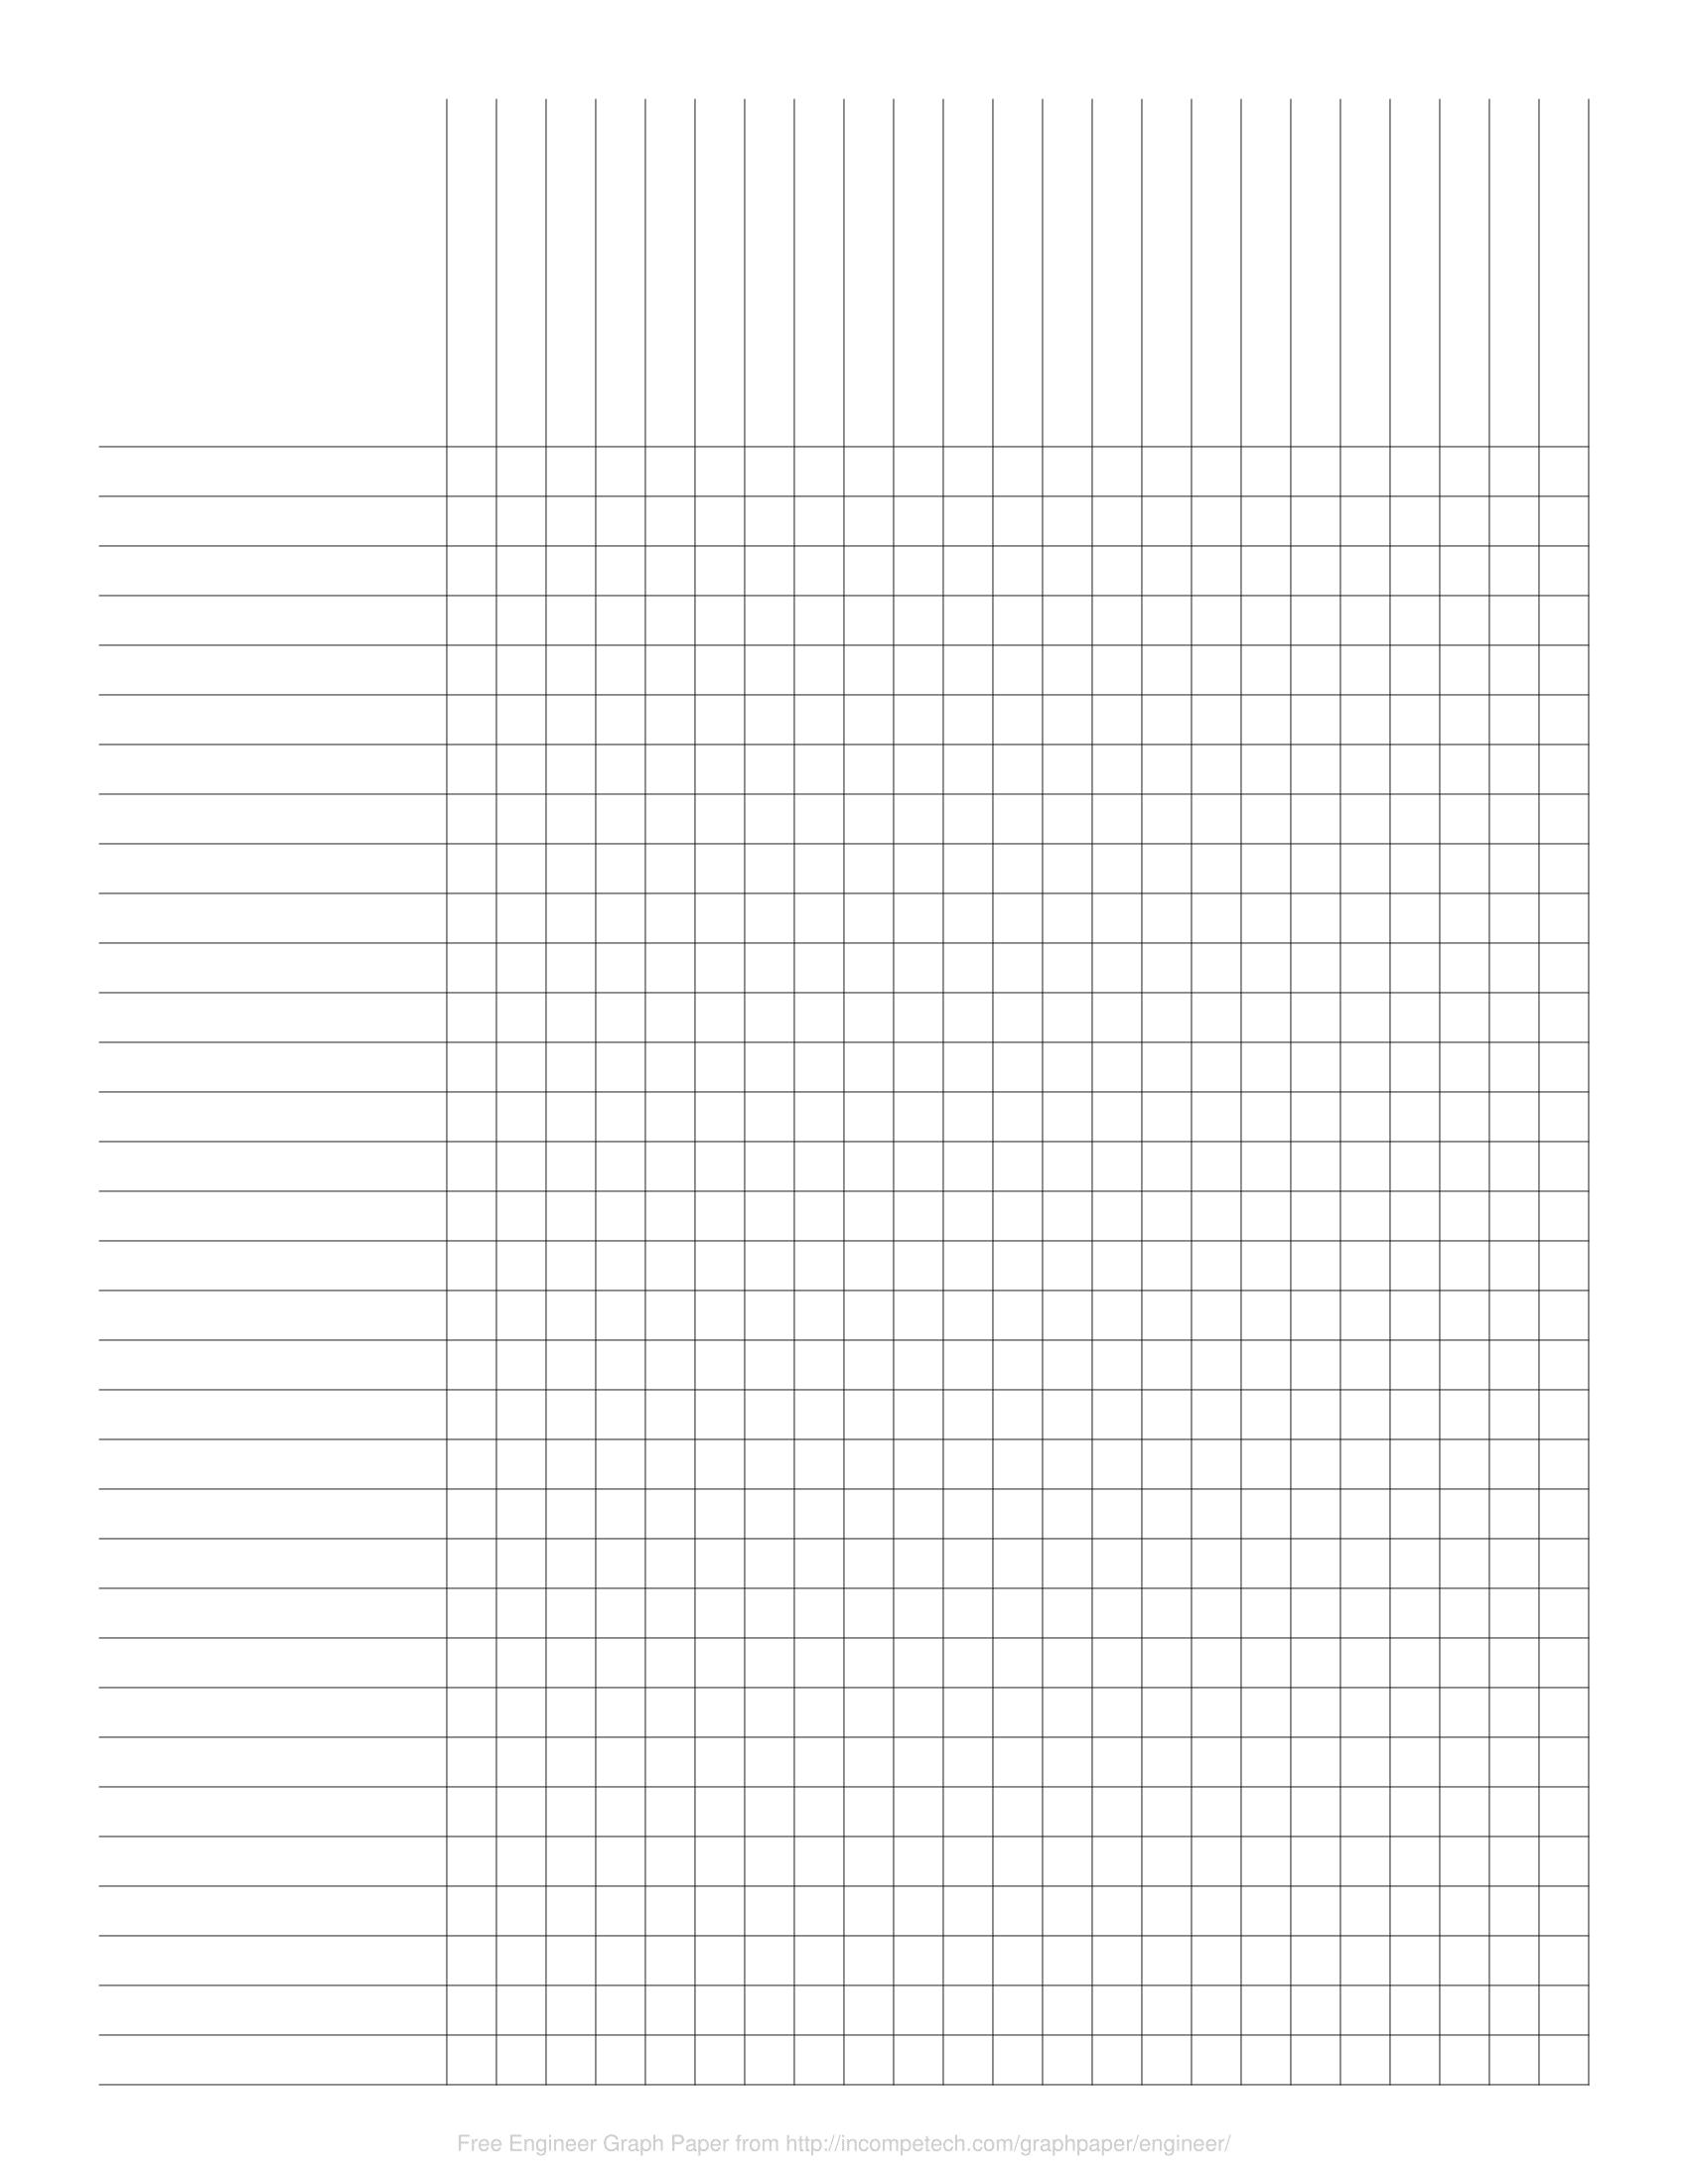 Free Online Graph Paper / Engineer - Free Printable Column Paper